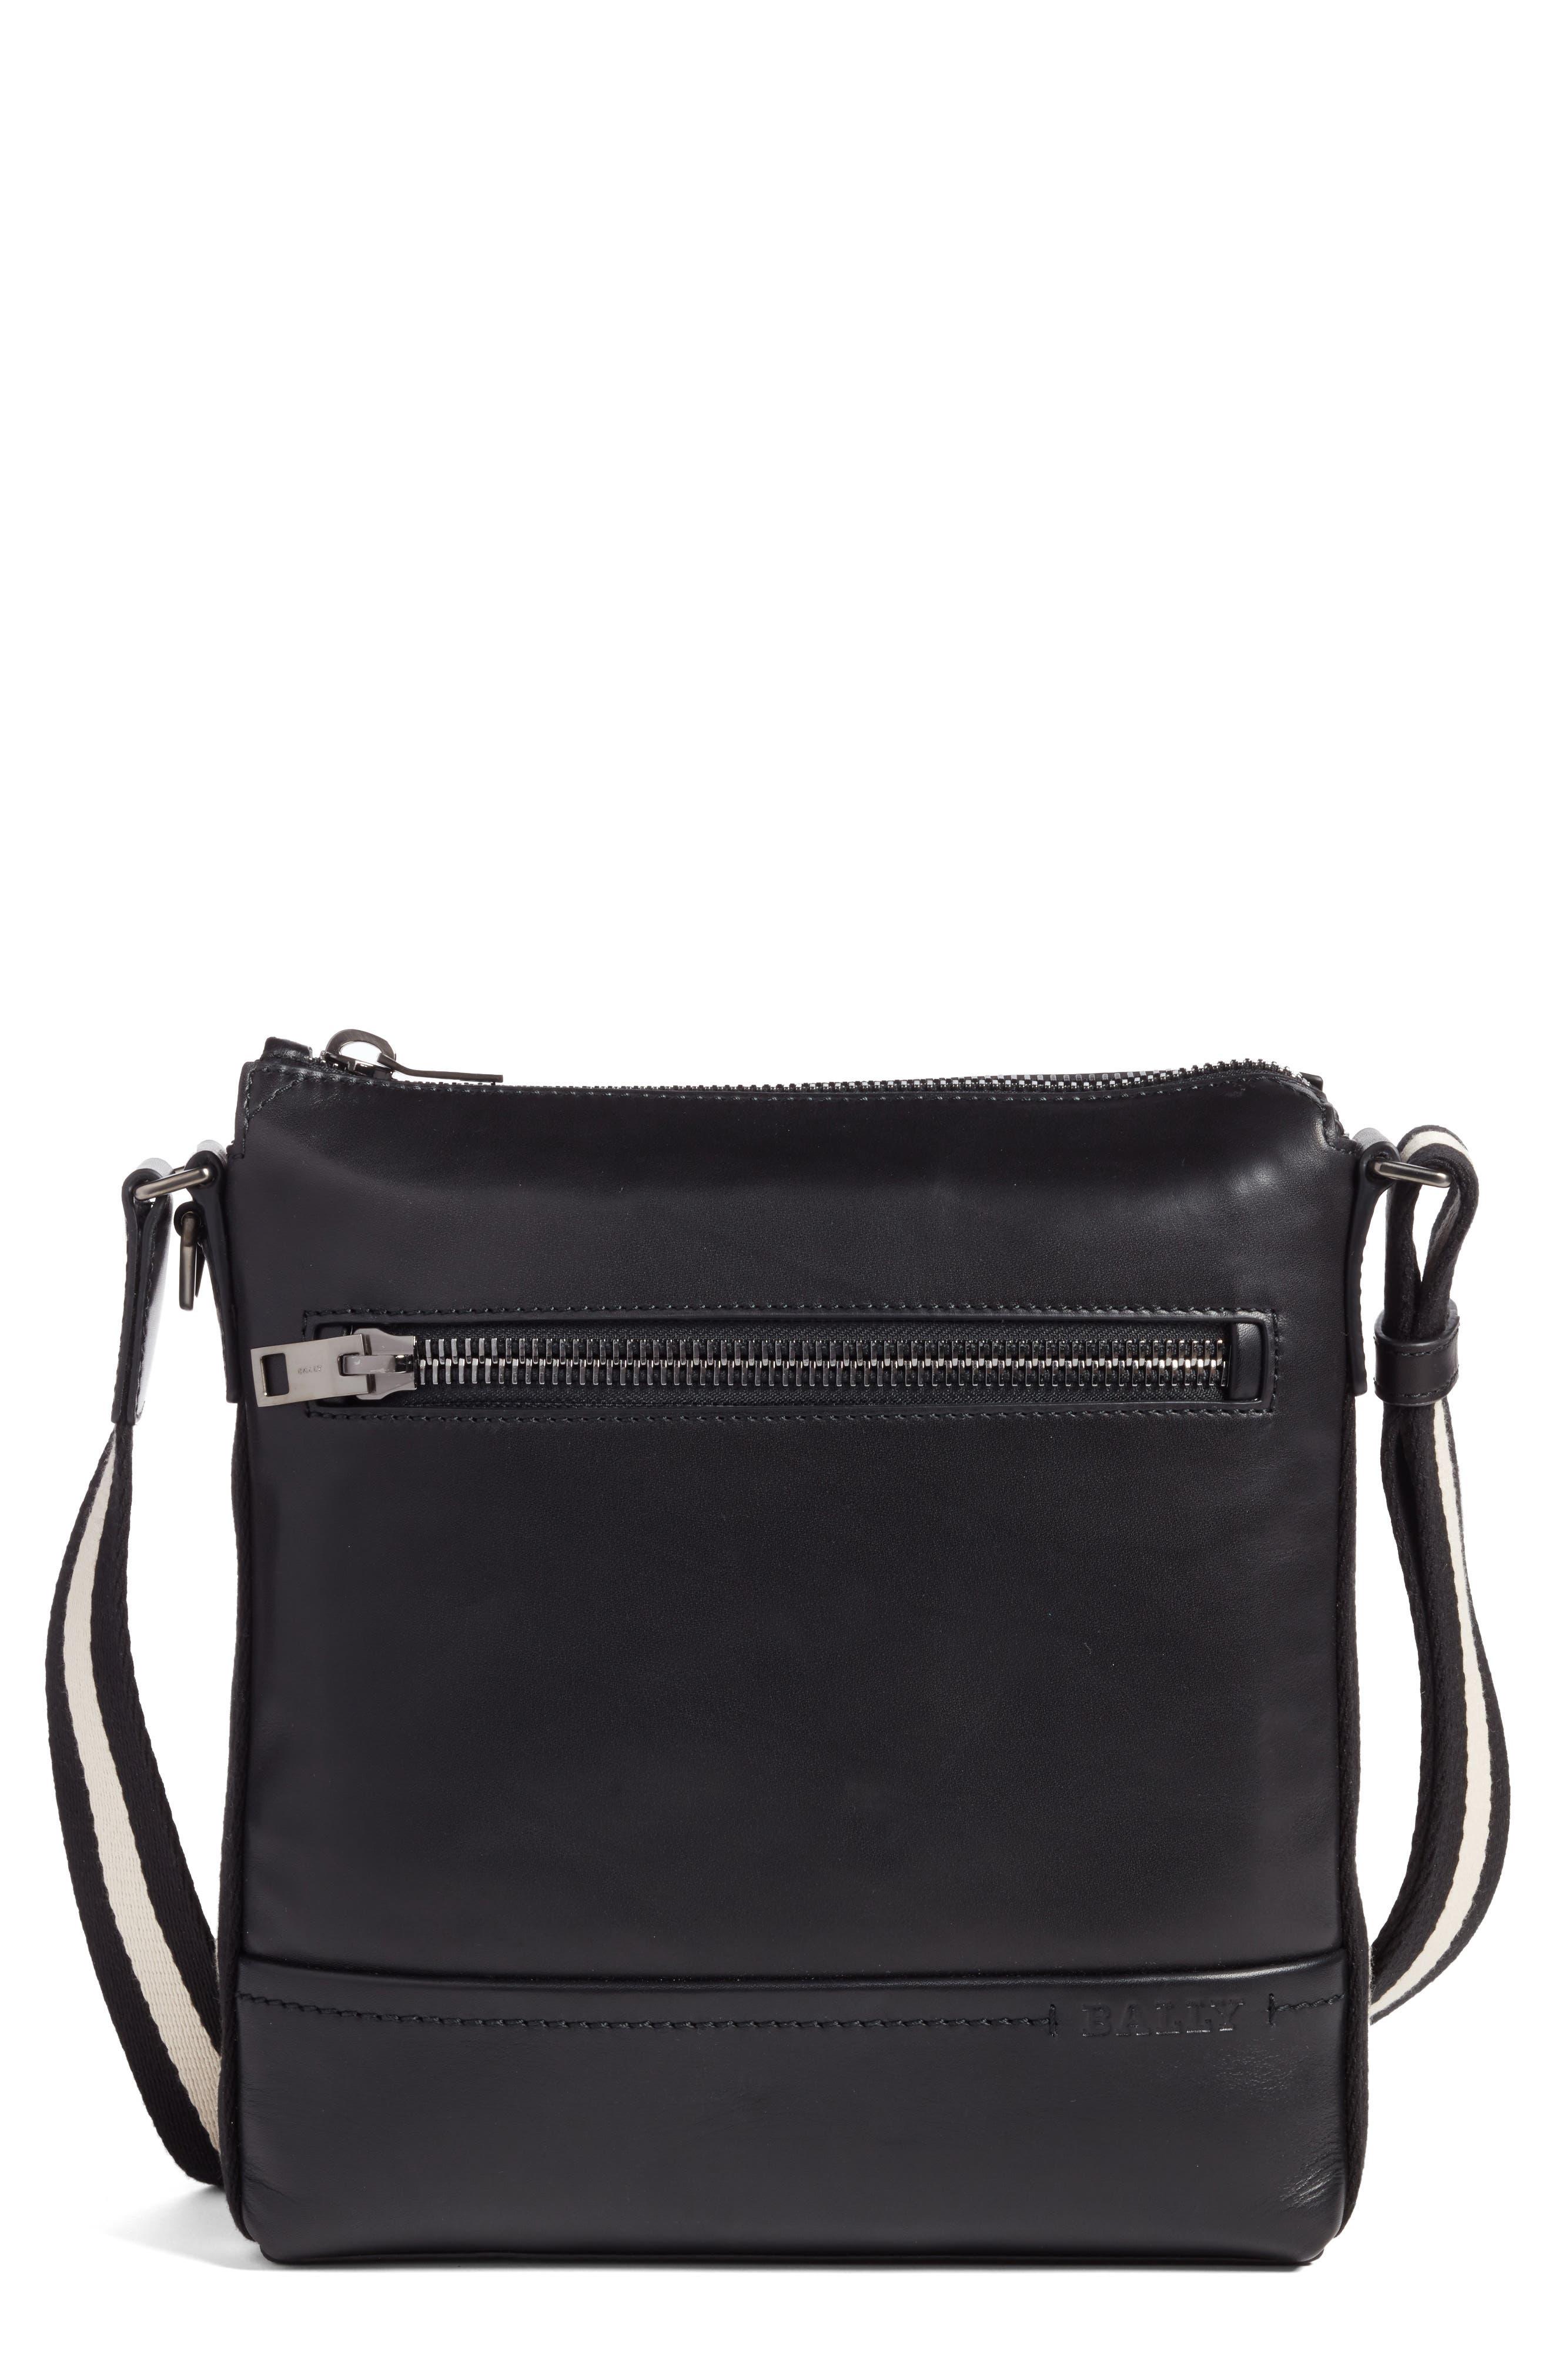 BALLY Trezzini Leather Crossbody Bag, Main, color, 001